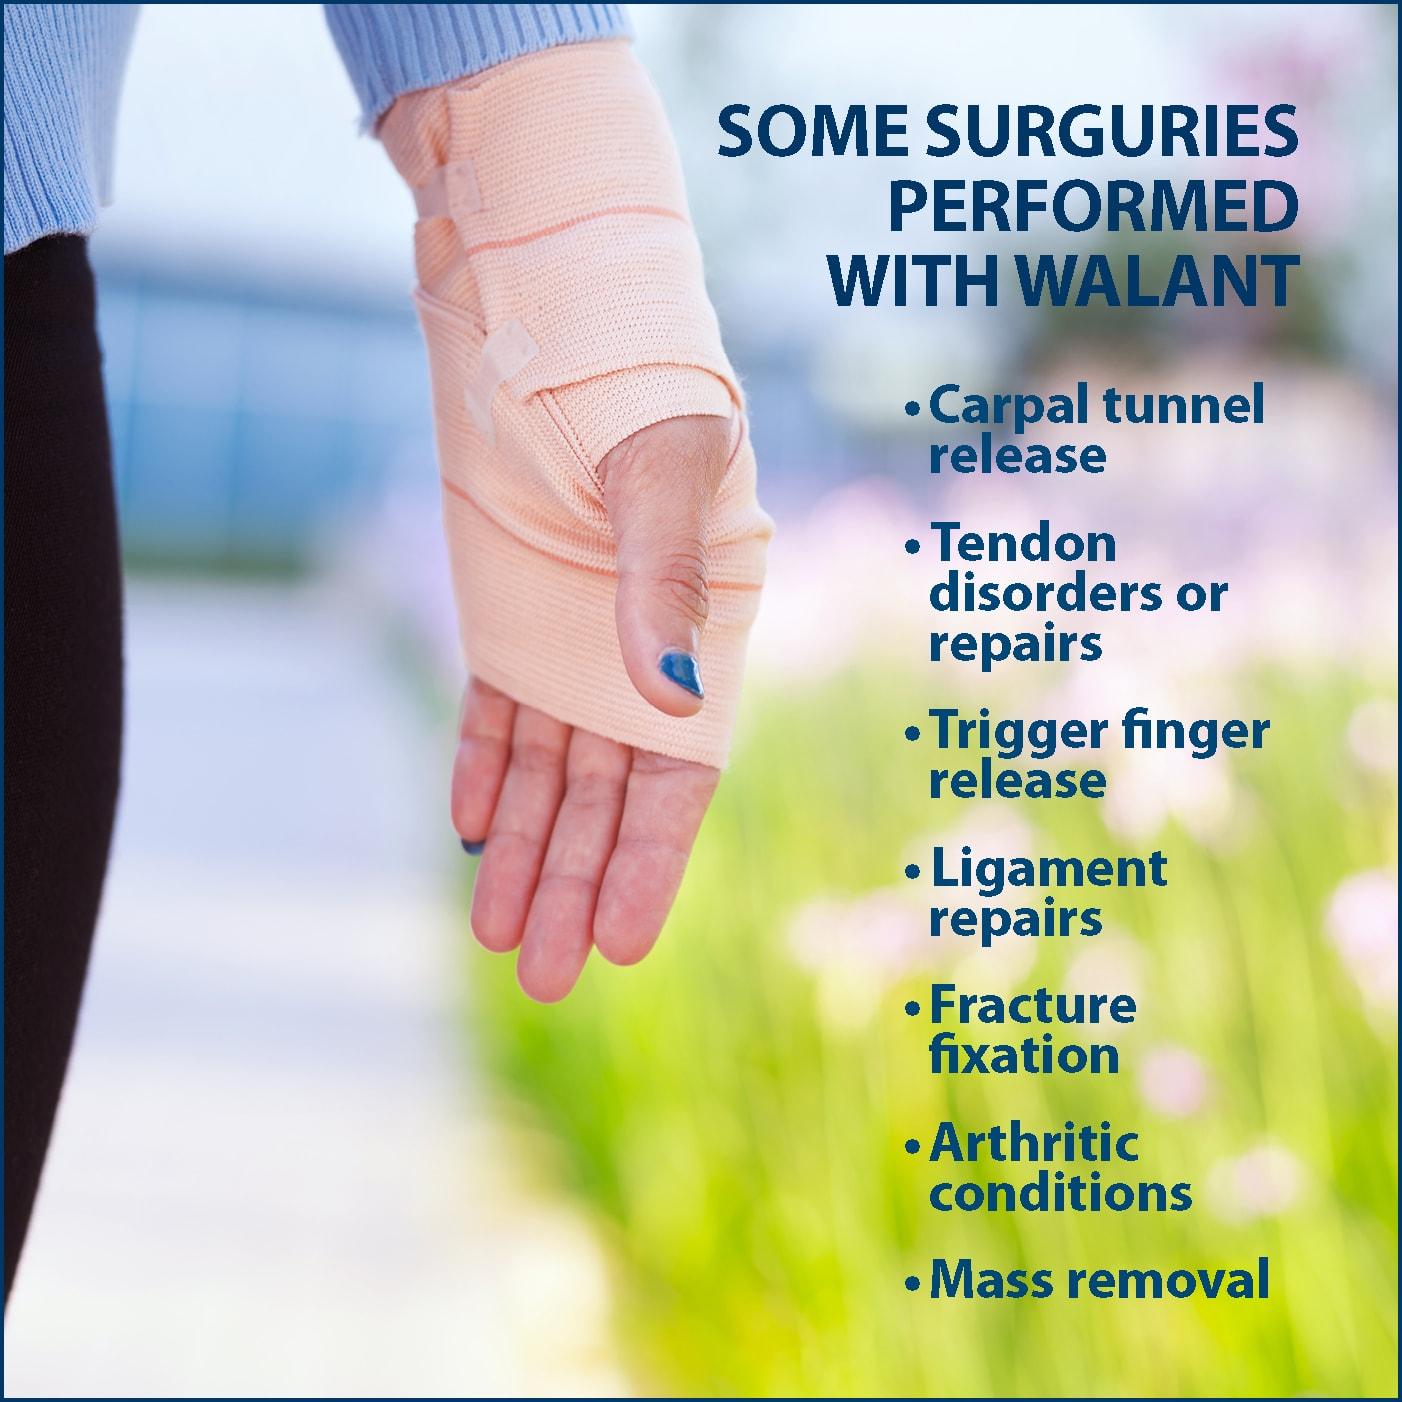 WALANT Wide Awake Local Anesthesia No Tourniquet Surgery